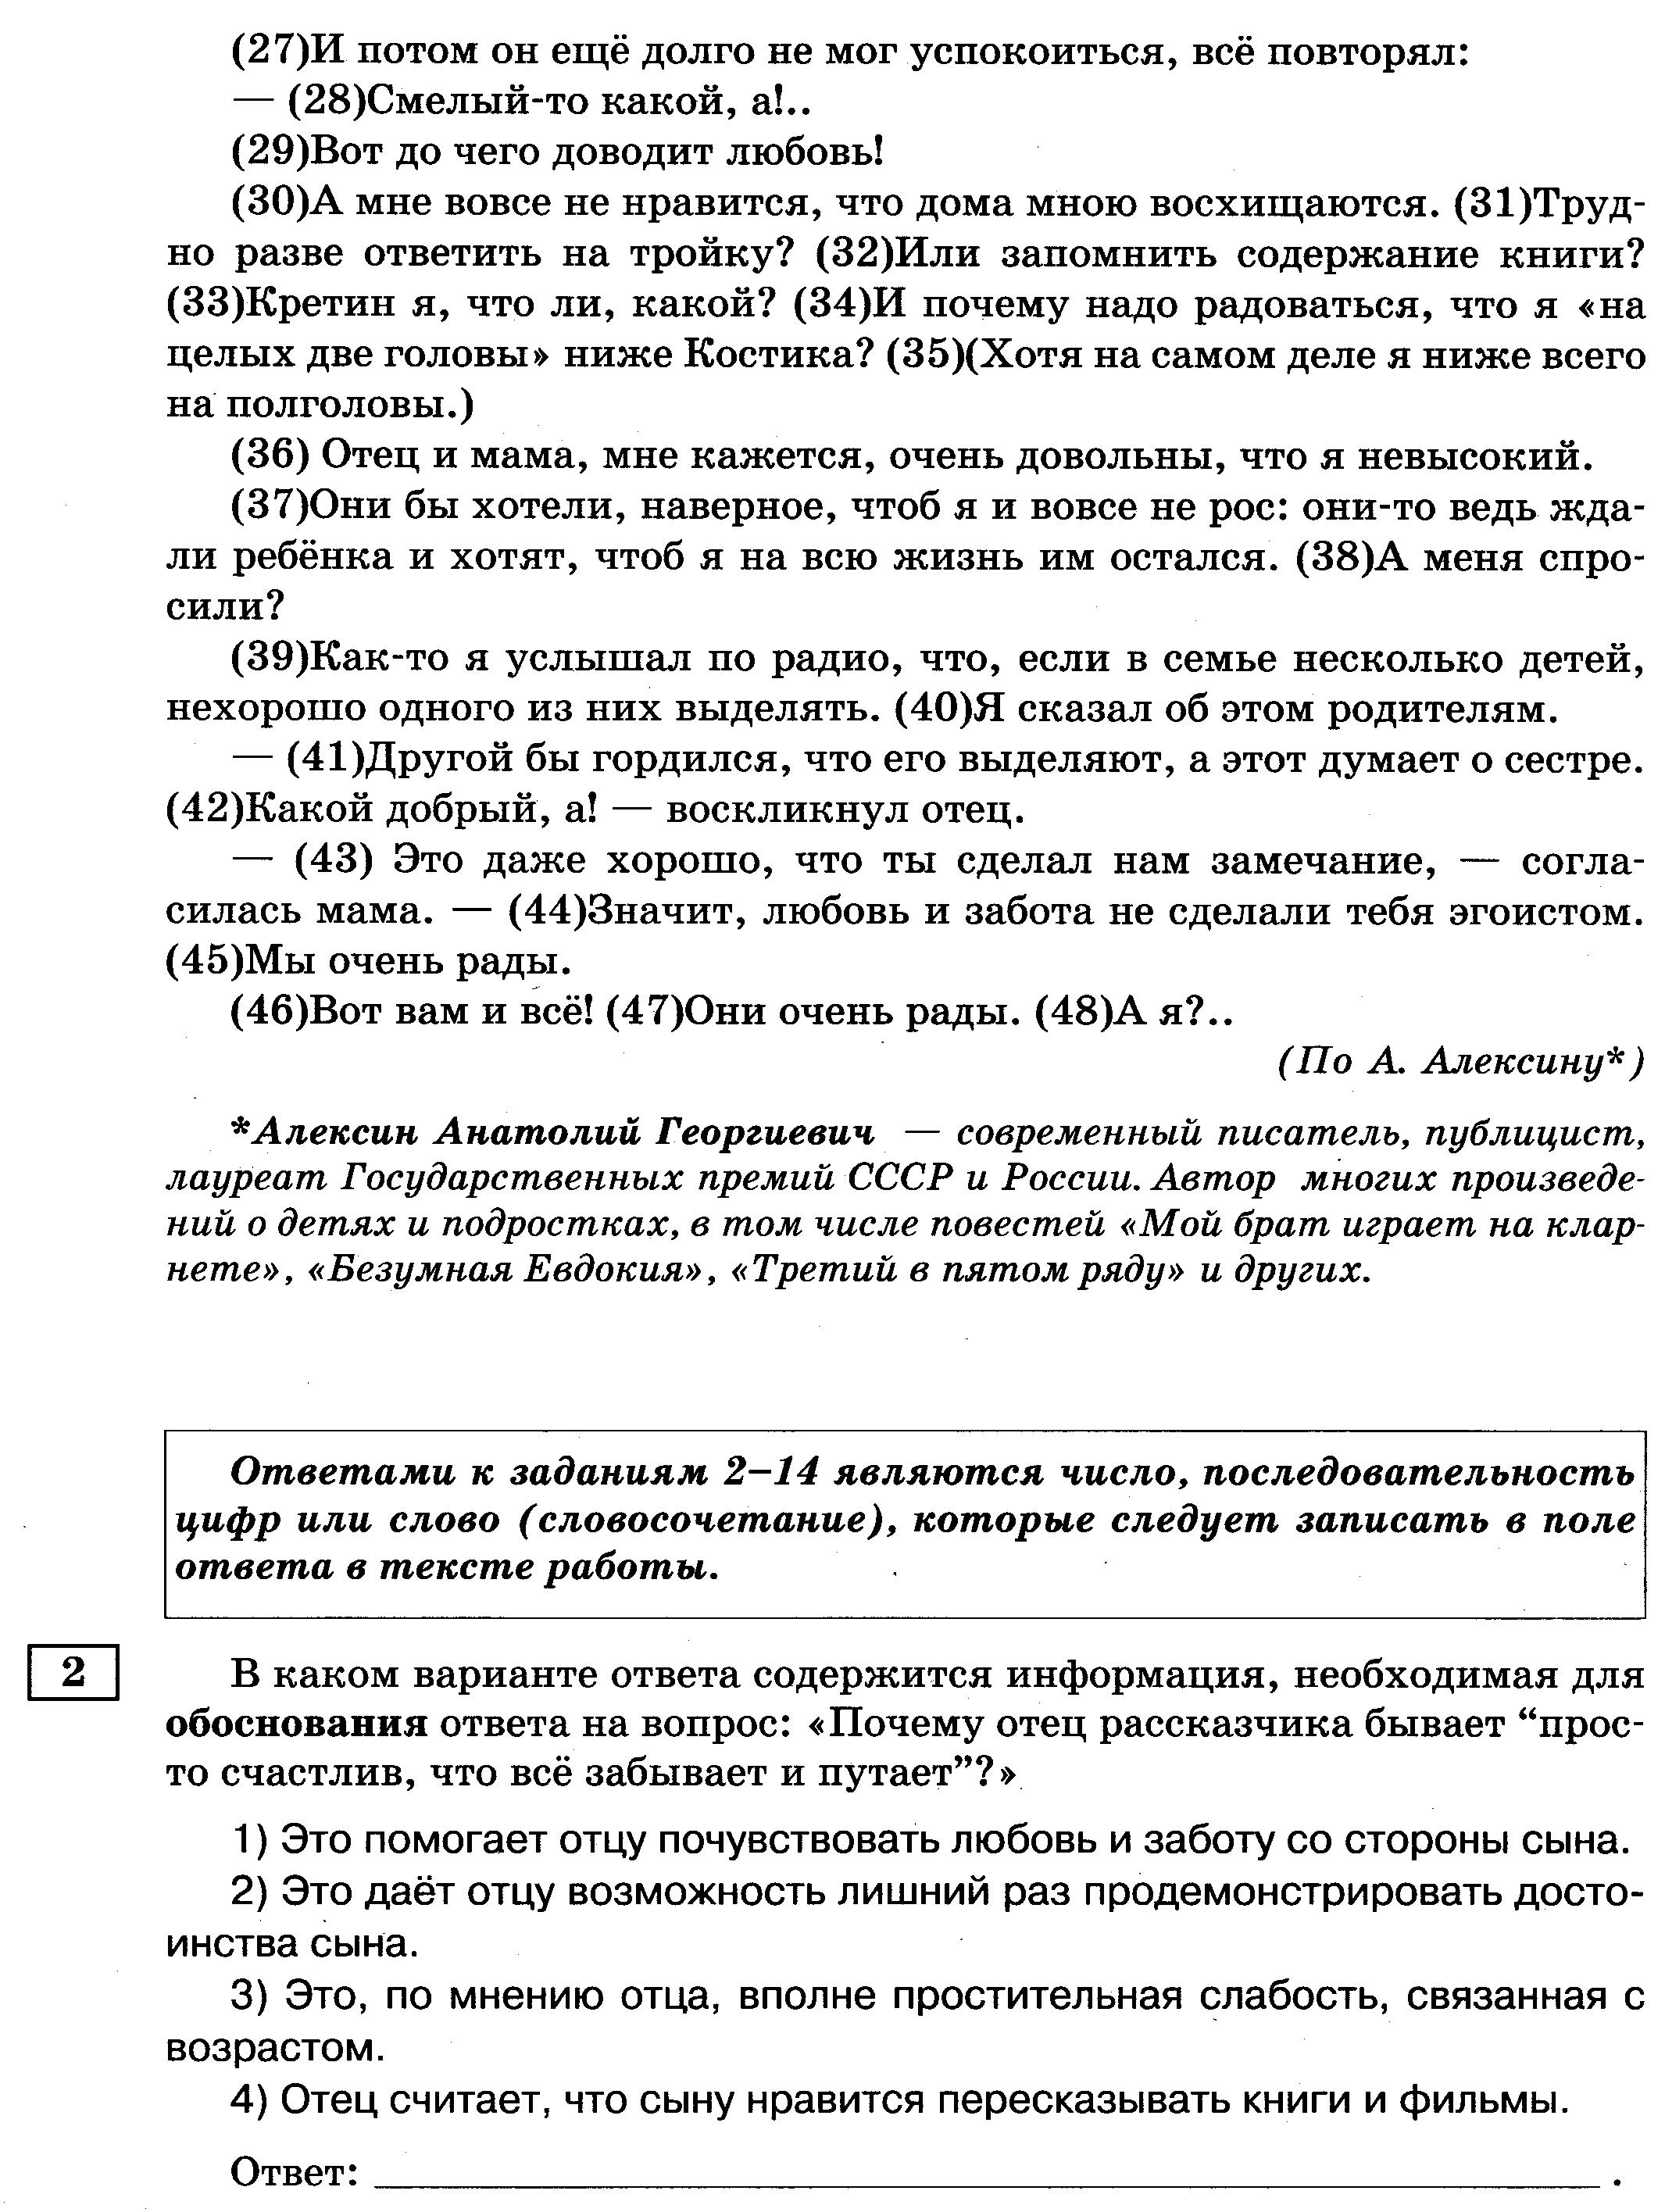 C:\Documents and Settings\Наташа\Рабочий стол\ОГЭ 2016\КИМы Степановой ОГЭ-2016\img290.jpg